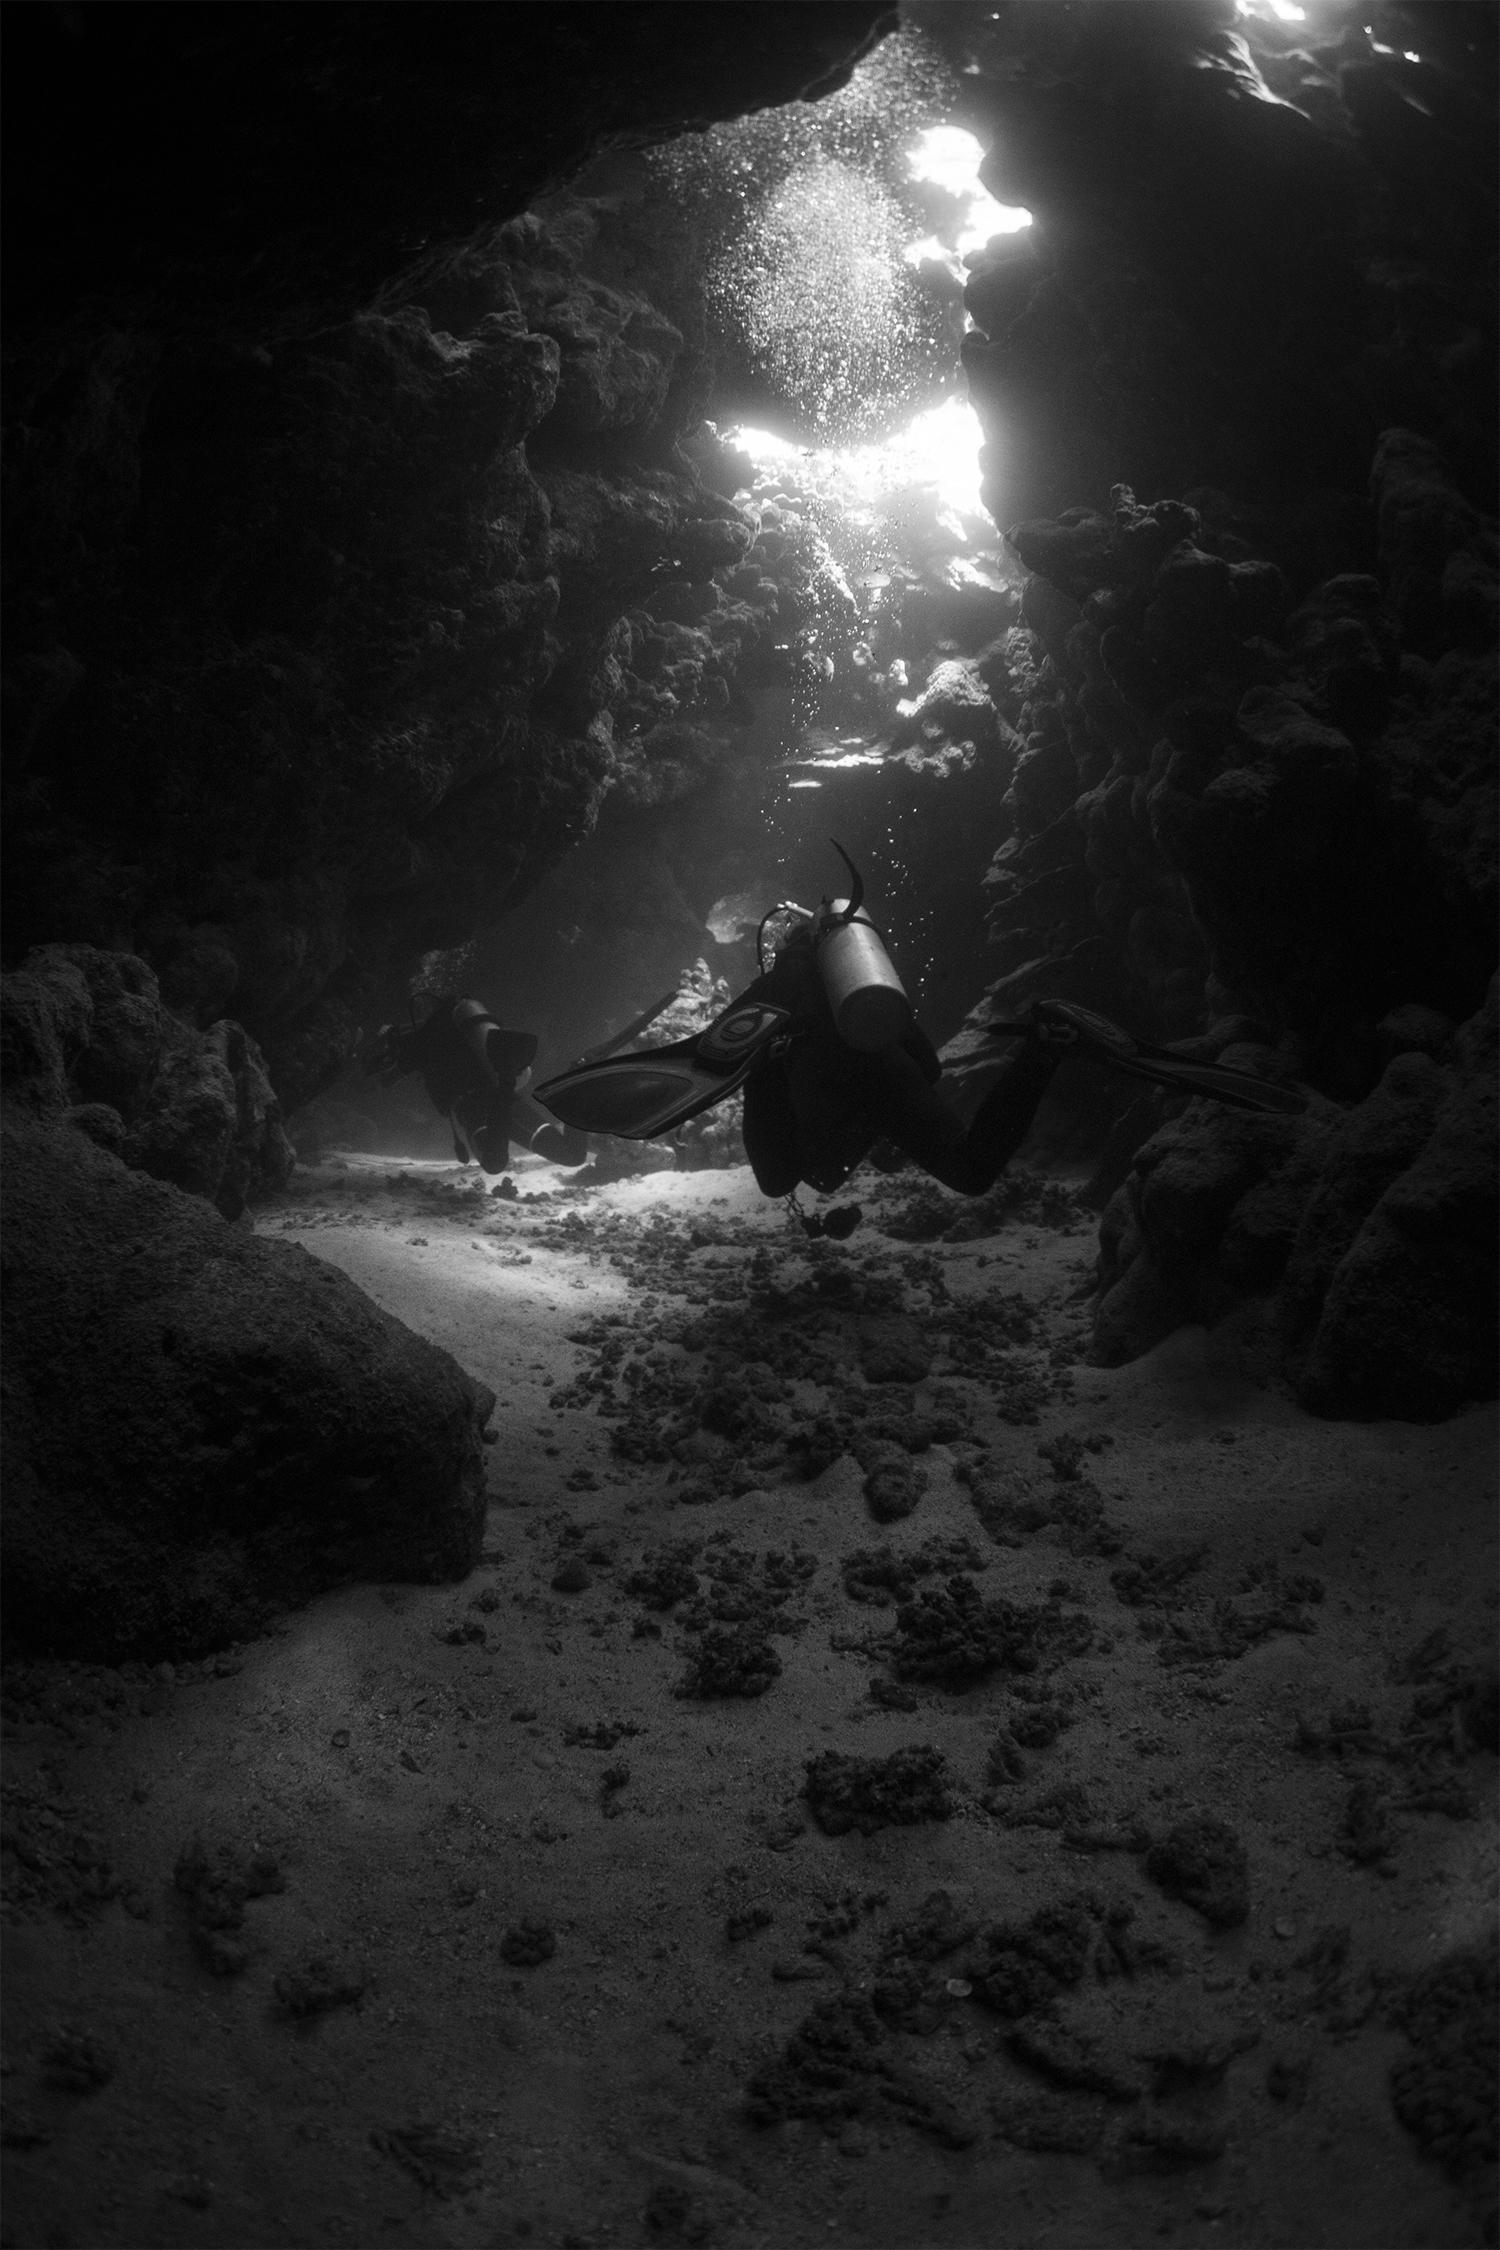 Alistair Cranstone - Cave_small.jpg